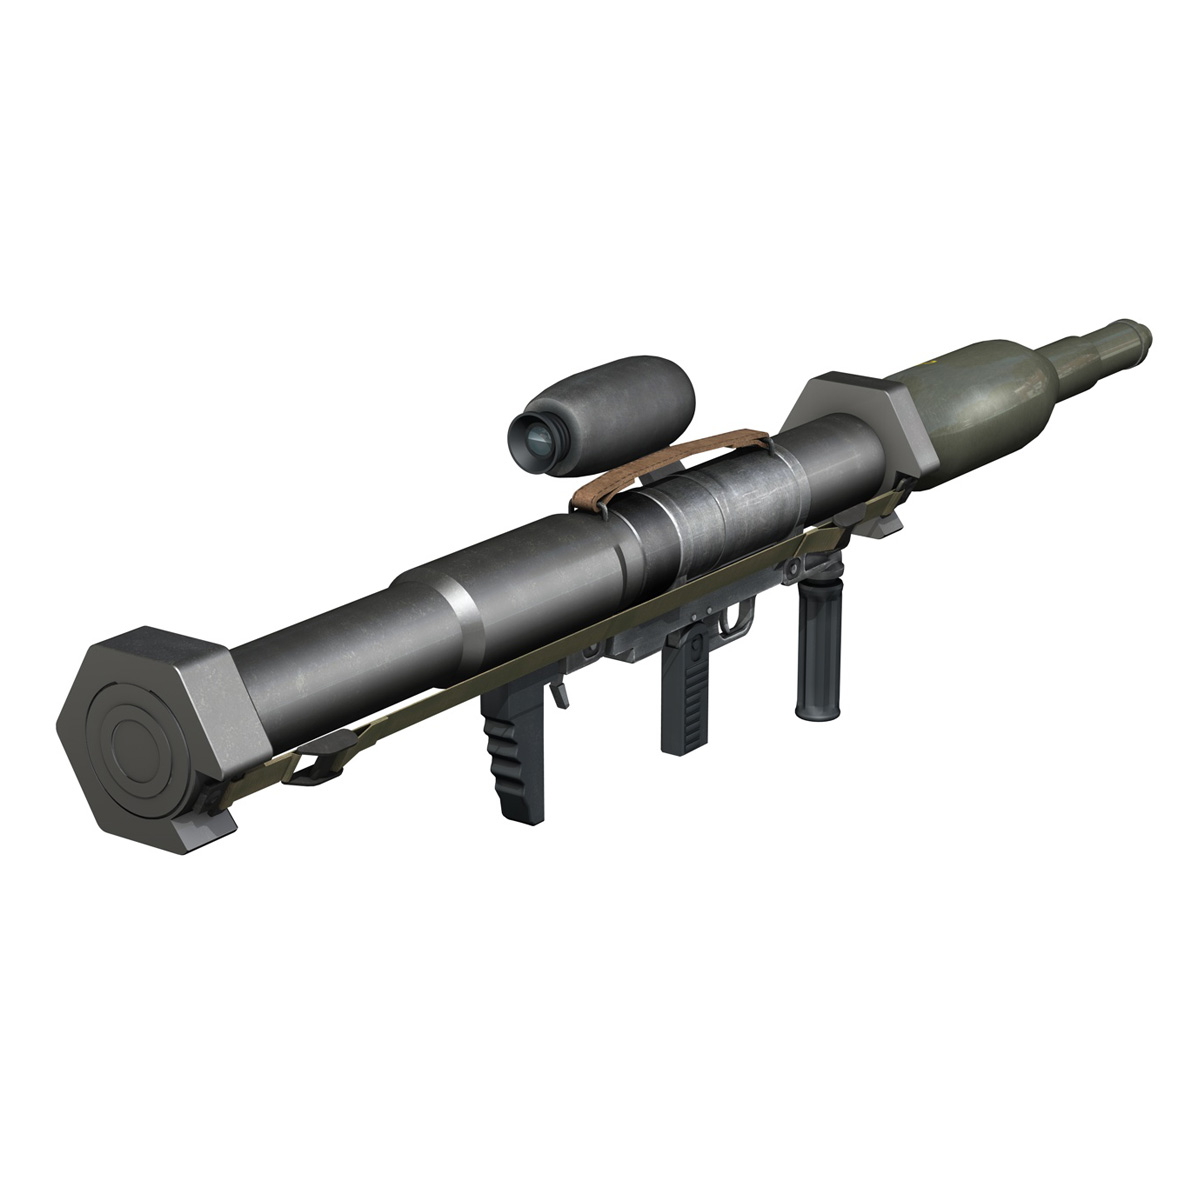 anti-tank raket başlatma panzerfaust 3 3d model 3ds c4d lwo obj 263700